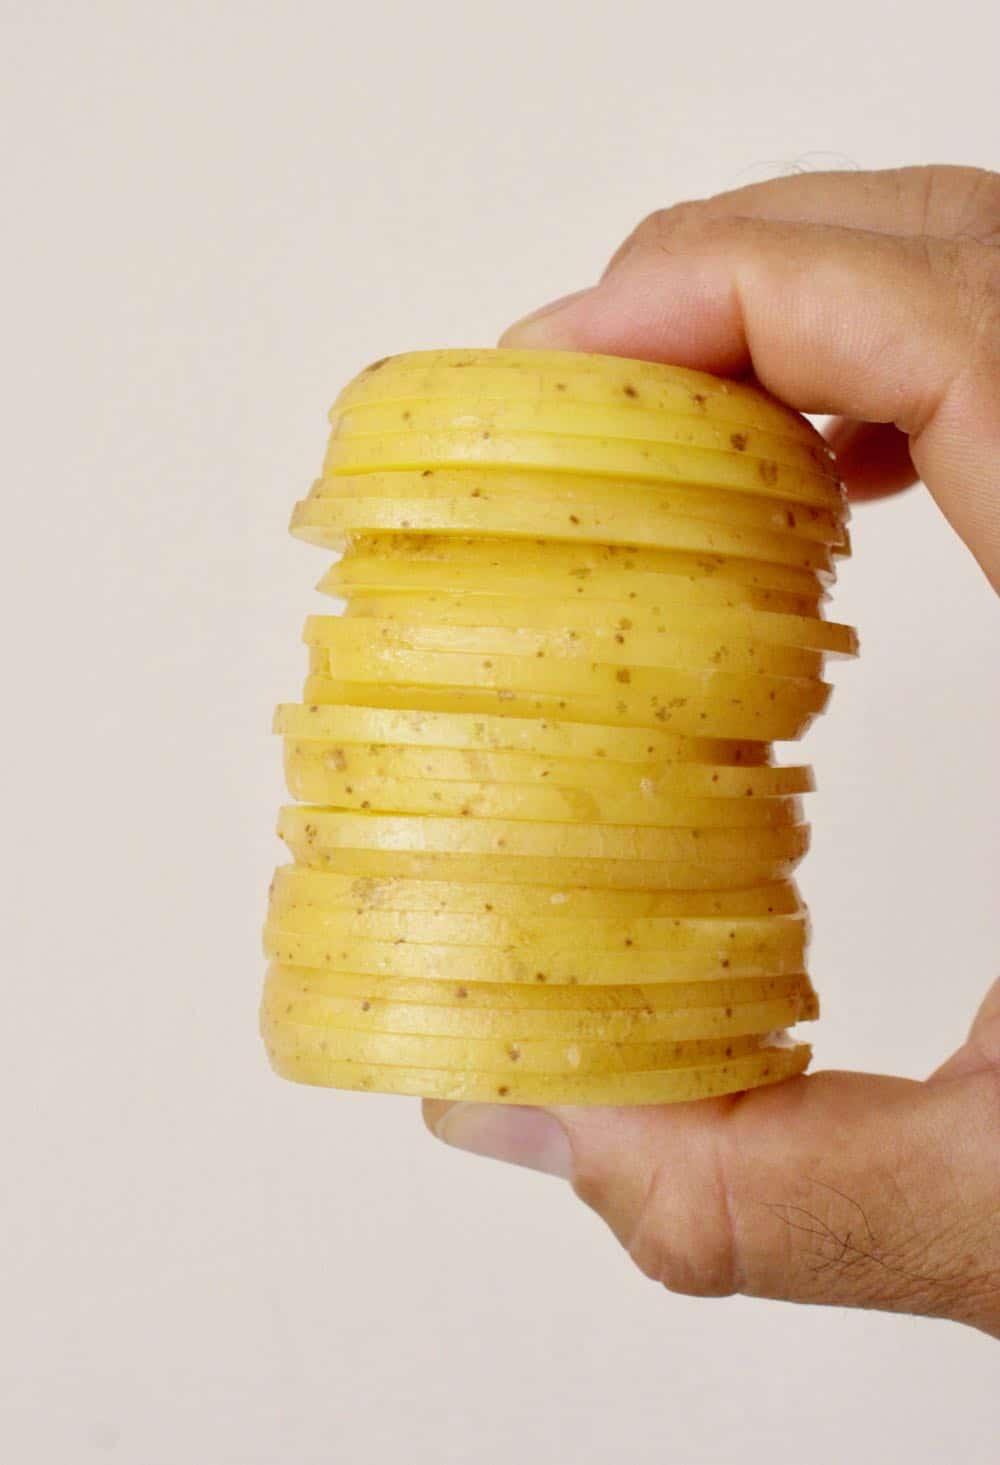 scalloped potato slices